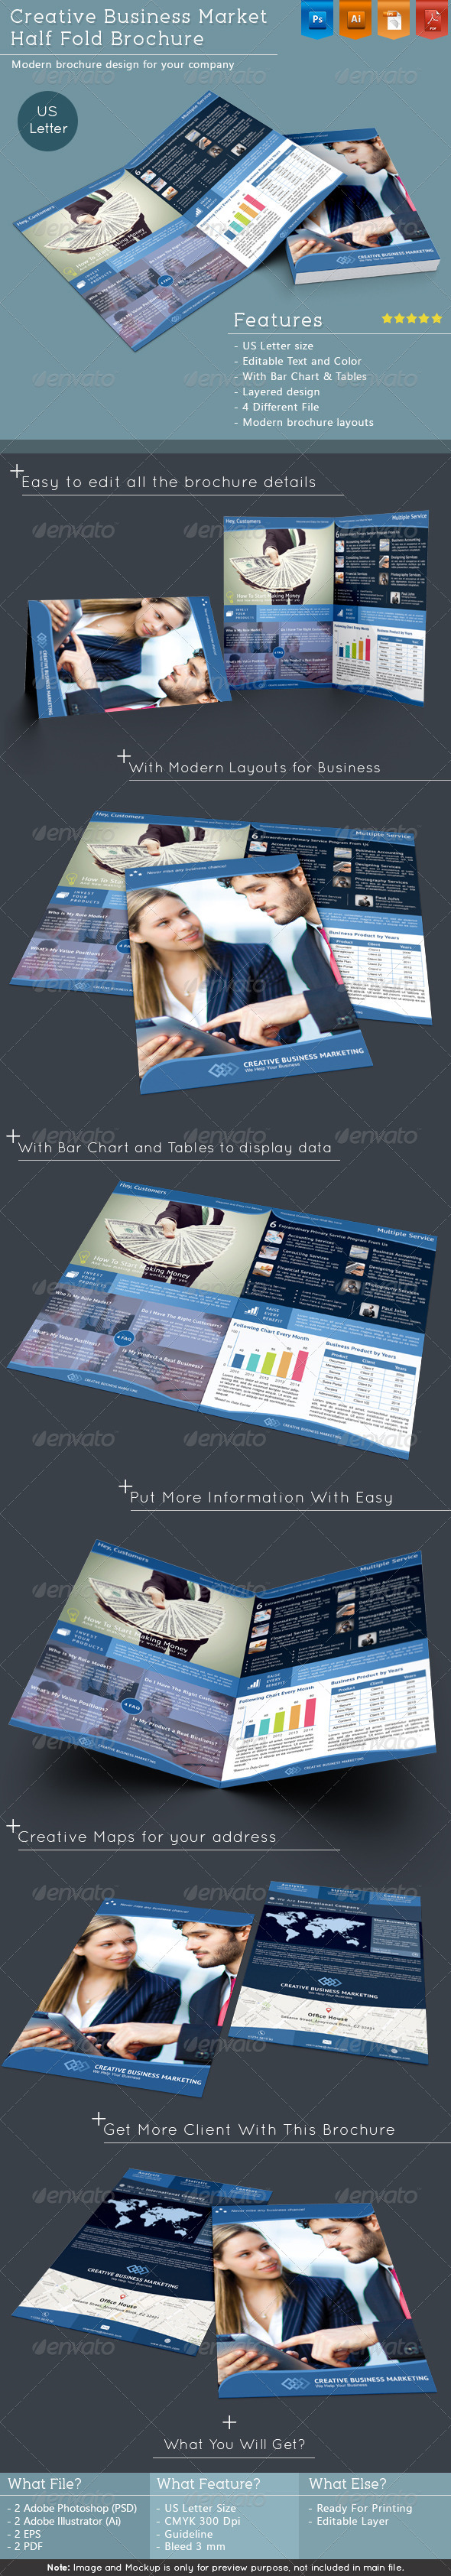 GraphicRiver Creative Business Market Half Fold Brochure 6518793